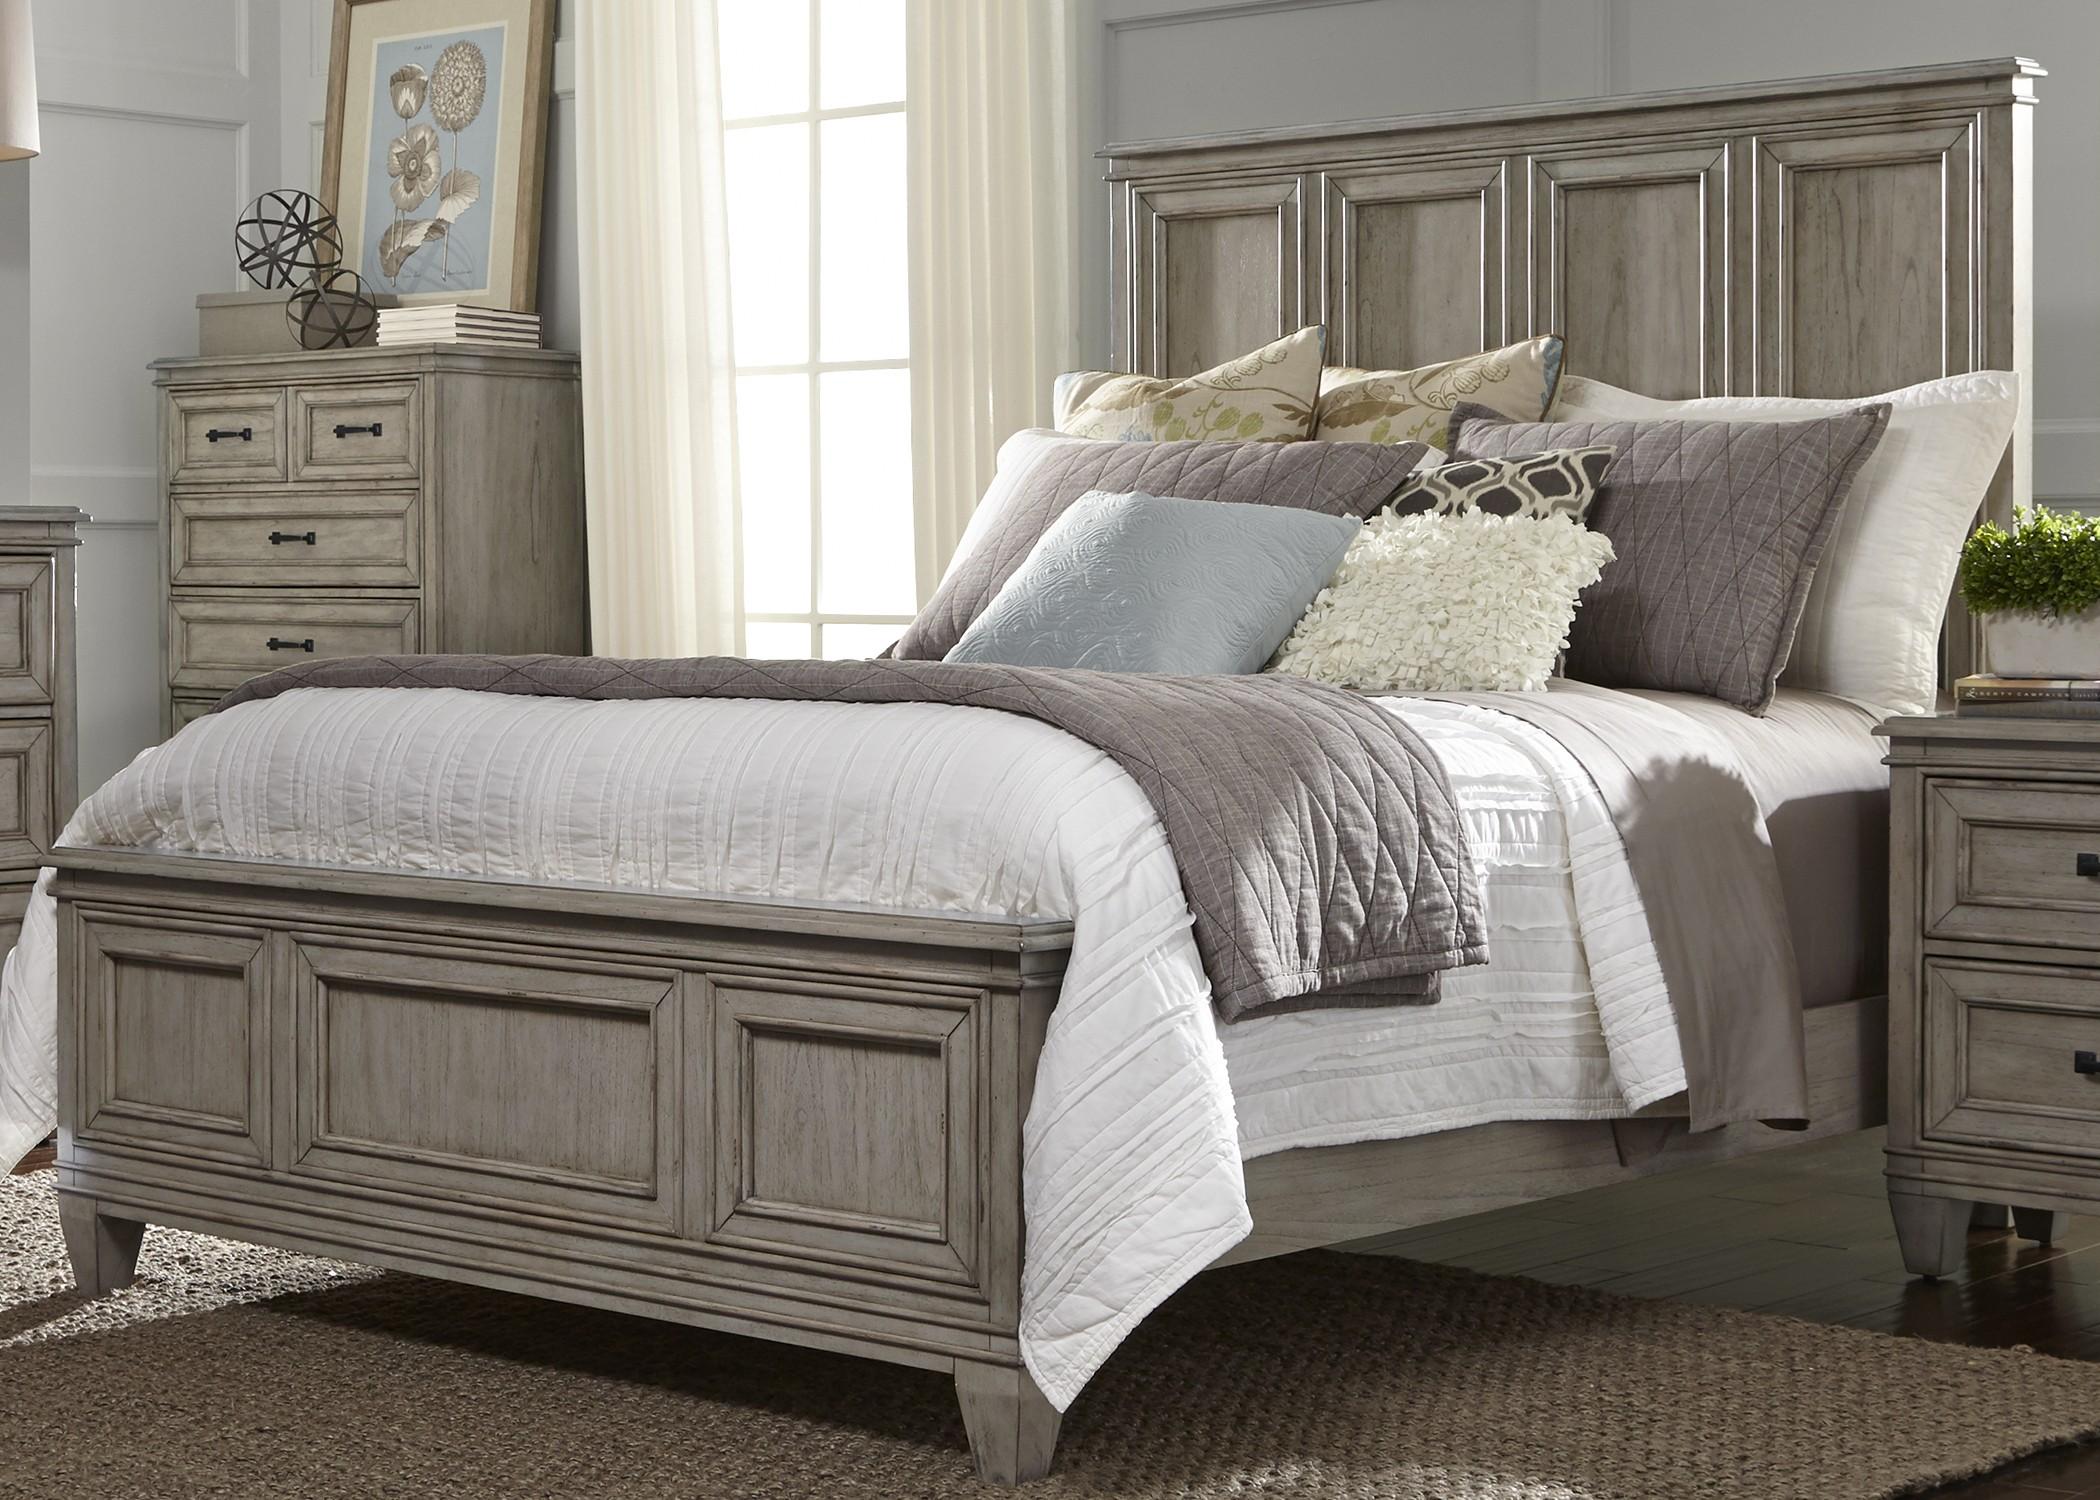 Grayton Grove Driftwood Panel Bedroom Set, 573-BR-QPB, Liberty